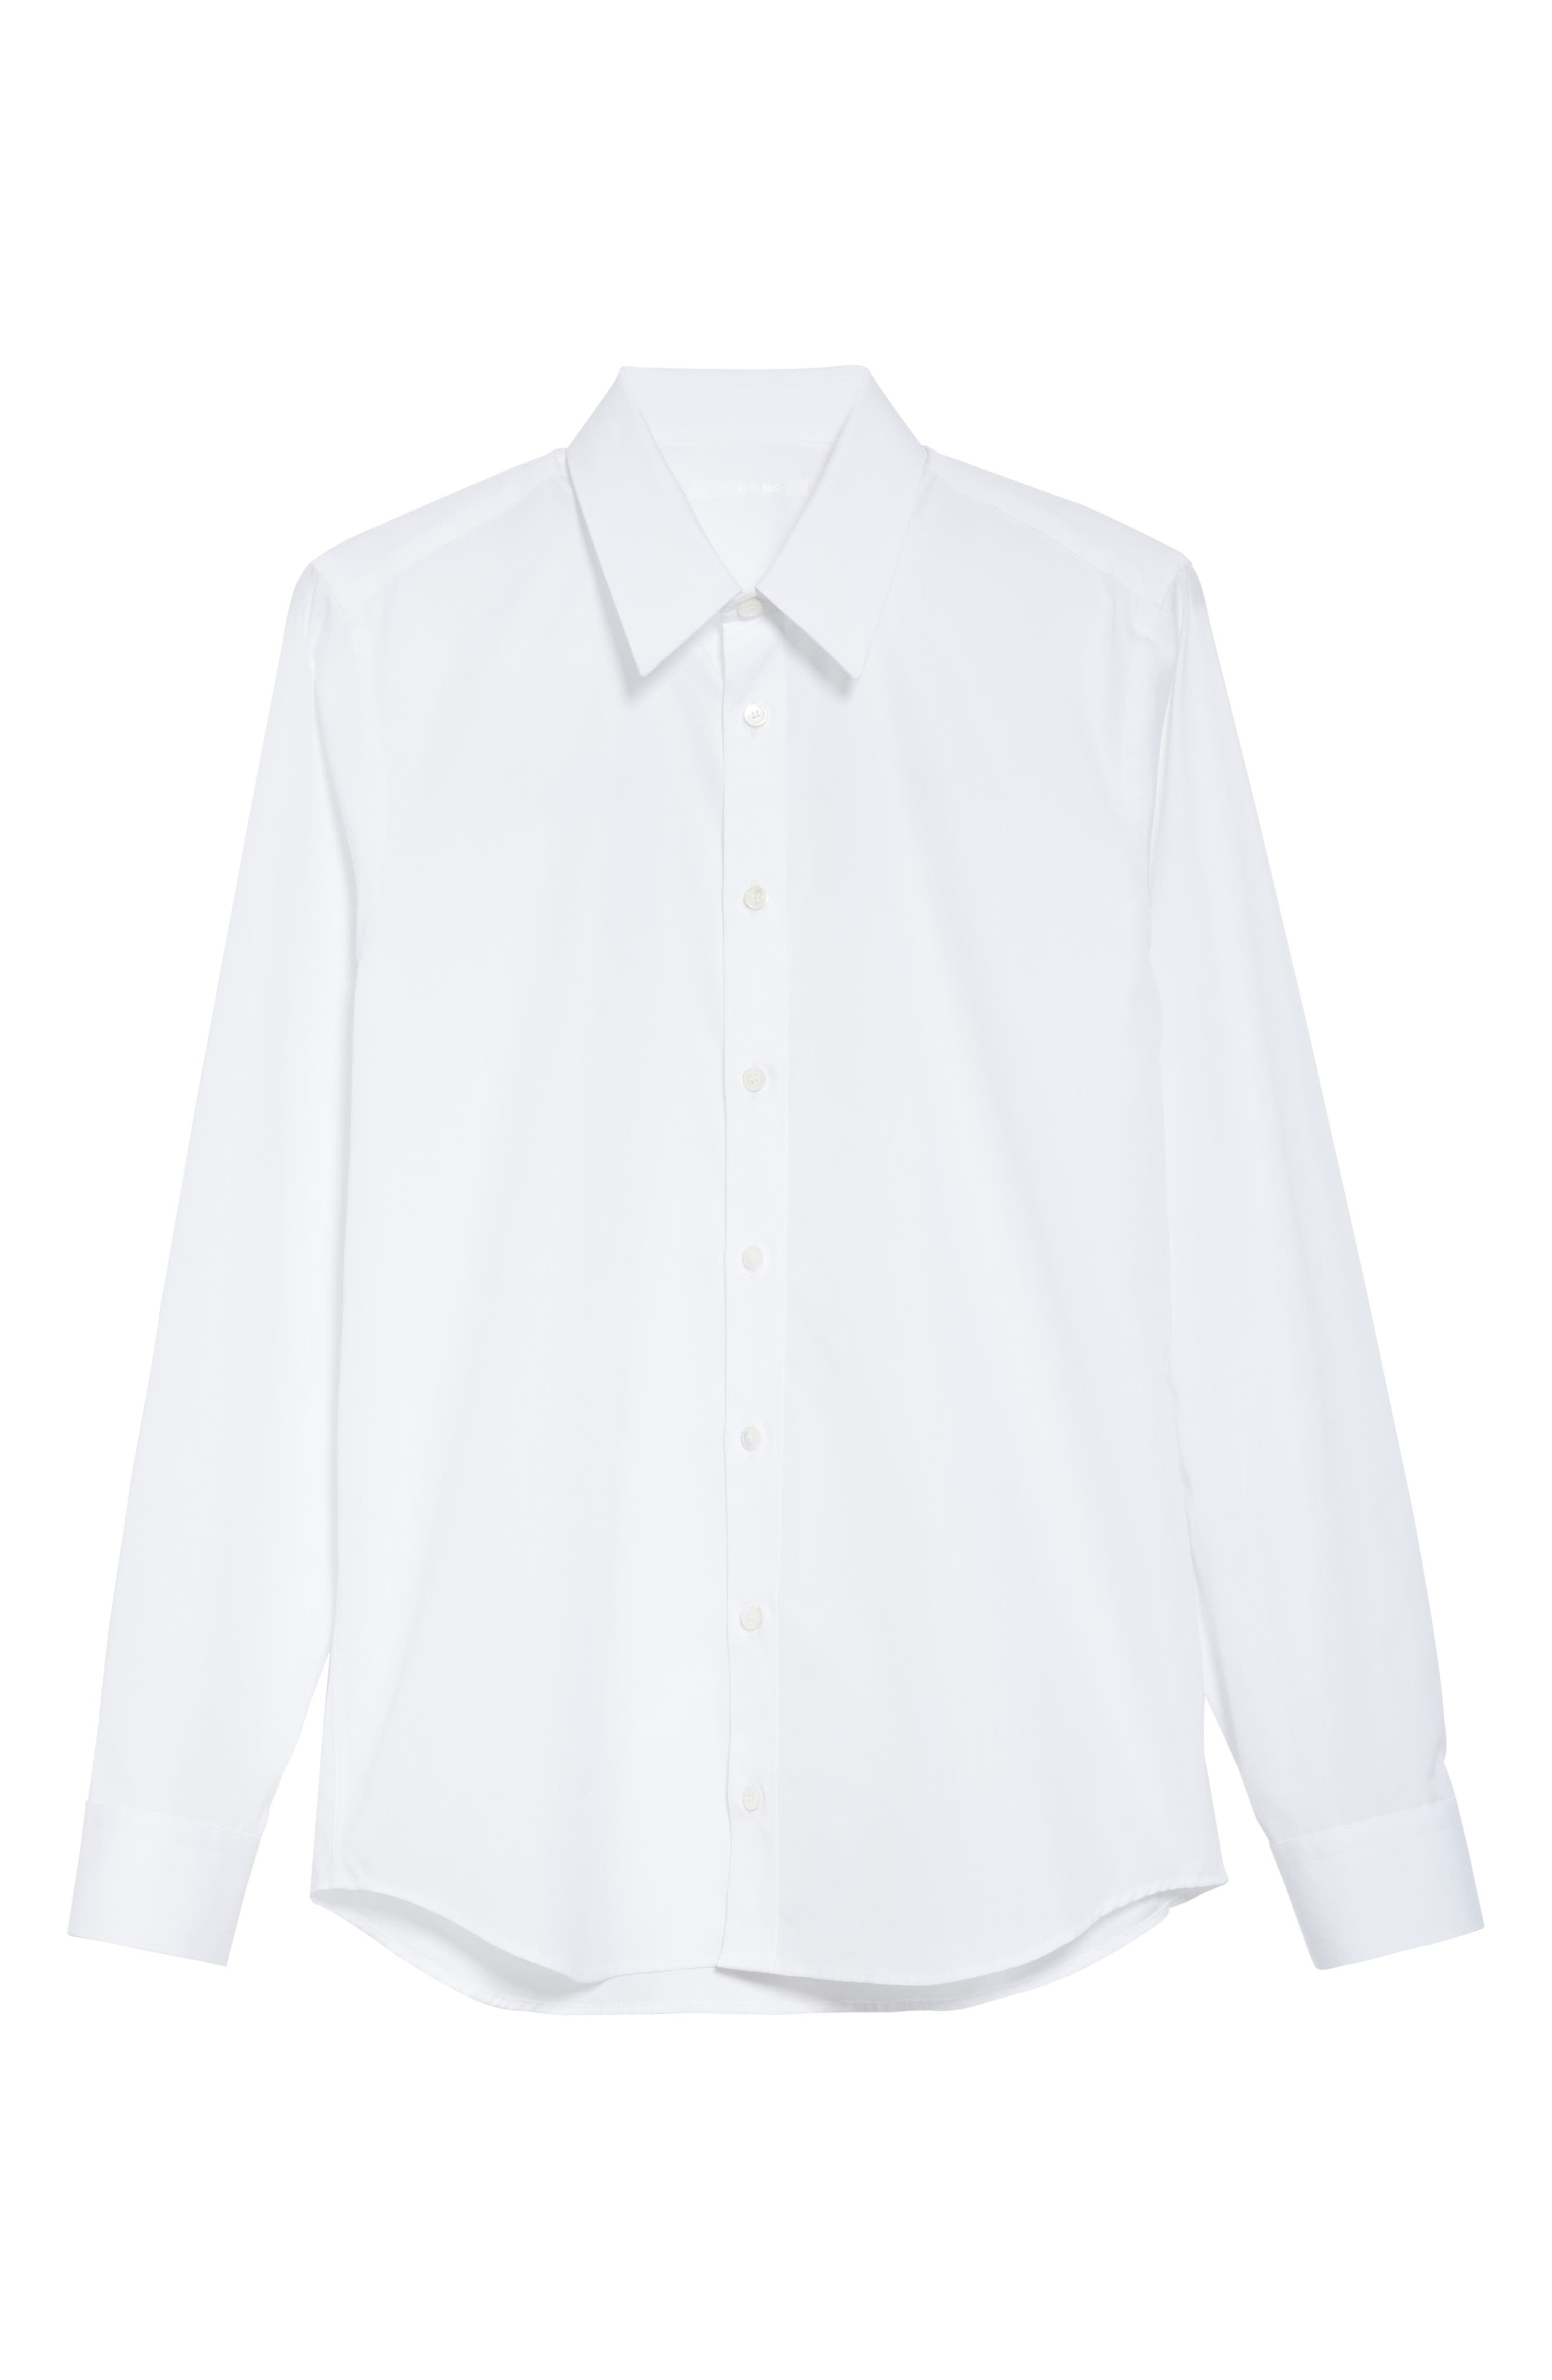 HELMUT LANG, Logo Print Dress Shirt, Alternate thumbnail 6, color, WHITE/SILVER